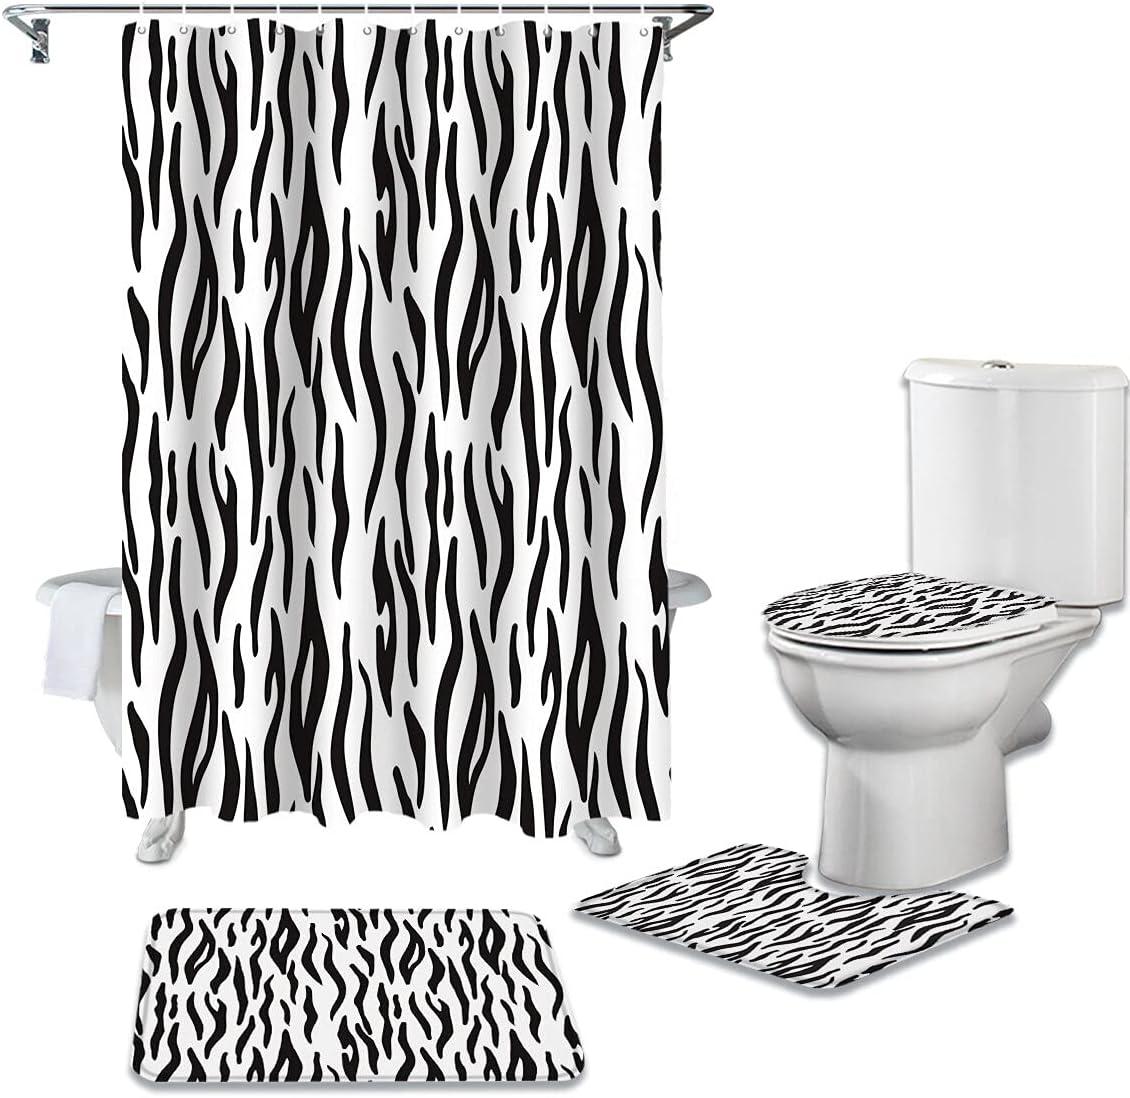 Animal Zebra Shower Curtain Toilet Max Dealing full price reduction 71% OFF Lid Bath Bathro Mat Set Cover